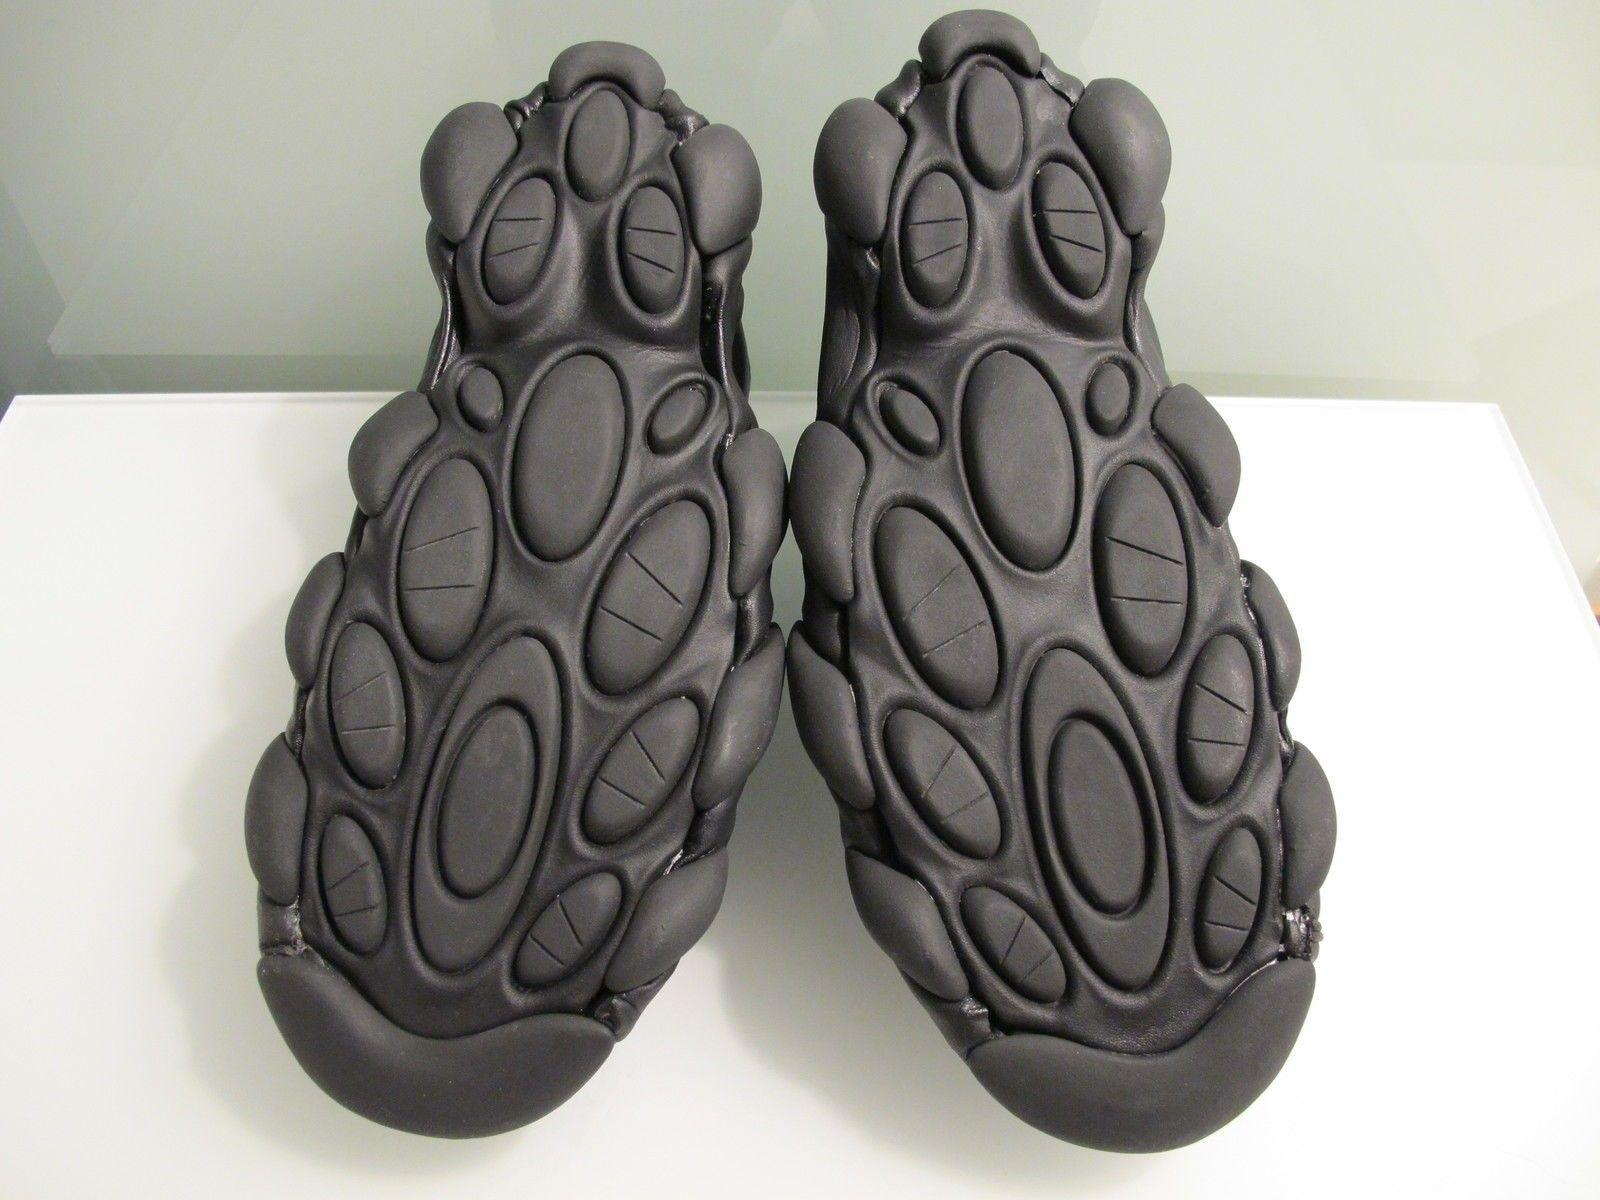 Arrowhead/ Flesh Prototype Shoes...anyone has any info on this? - $_57 (4).jpg